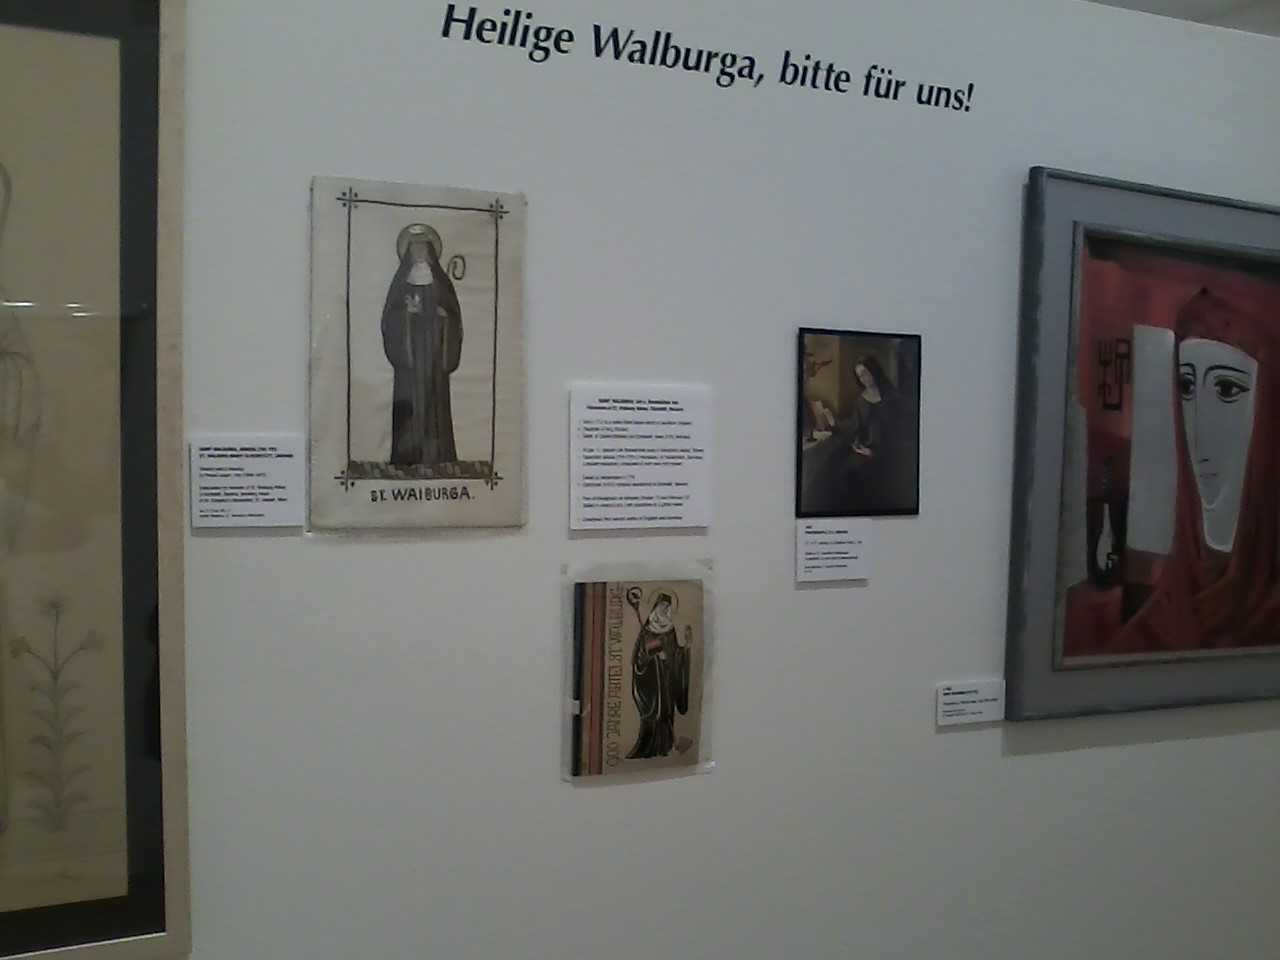 St. Scholastica and St. Walburga